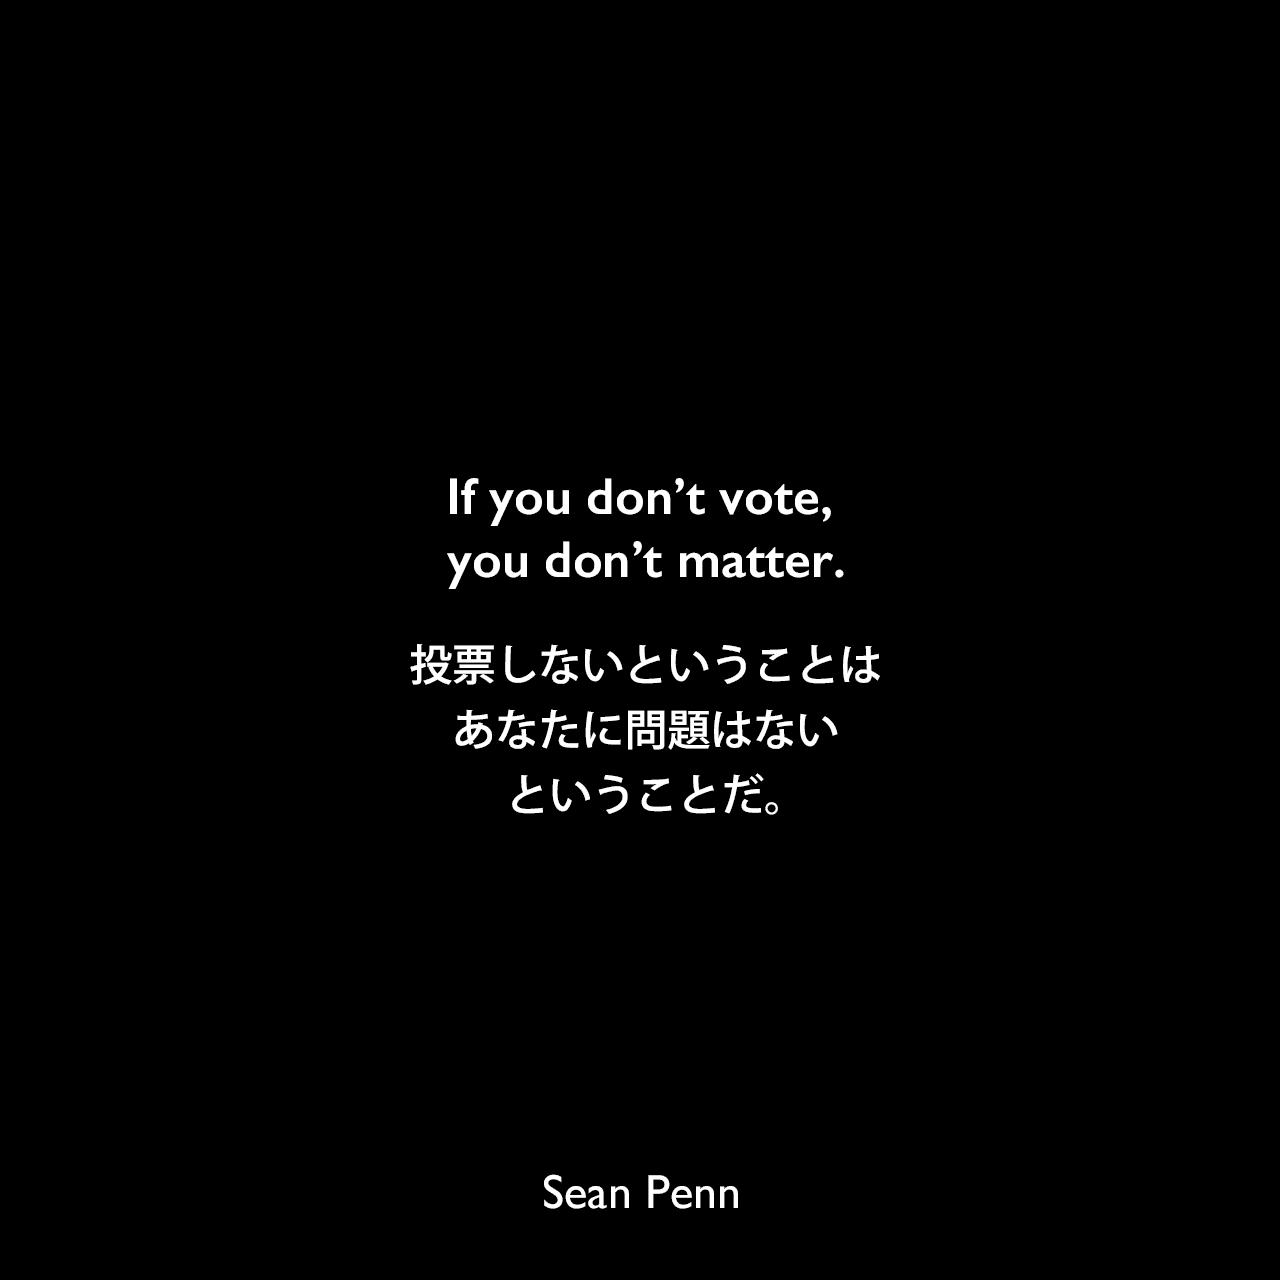 If you don't vote, you don't matter.投票しないということは、あなたに問題はないということだ。Sean Penn